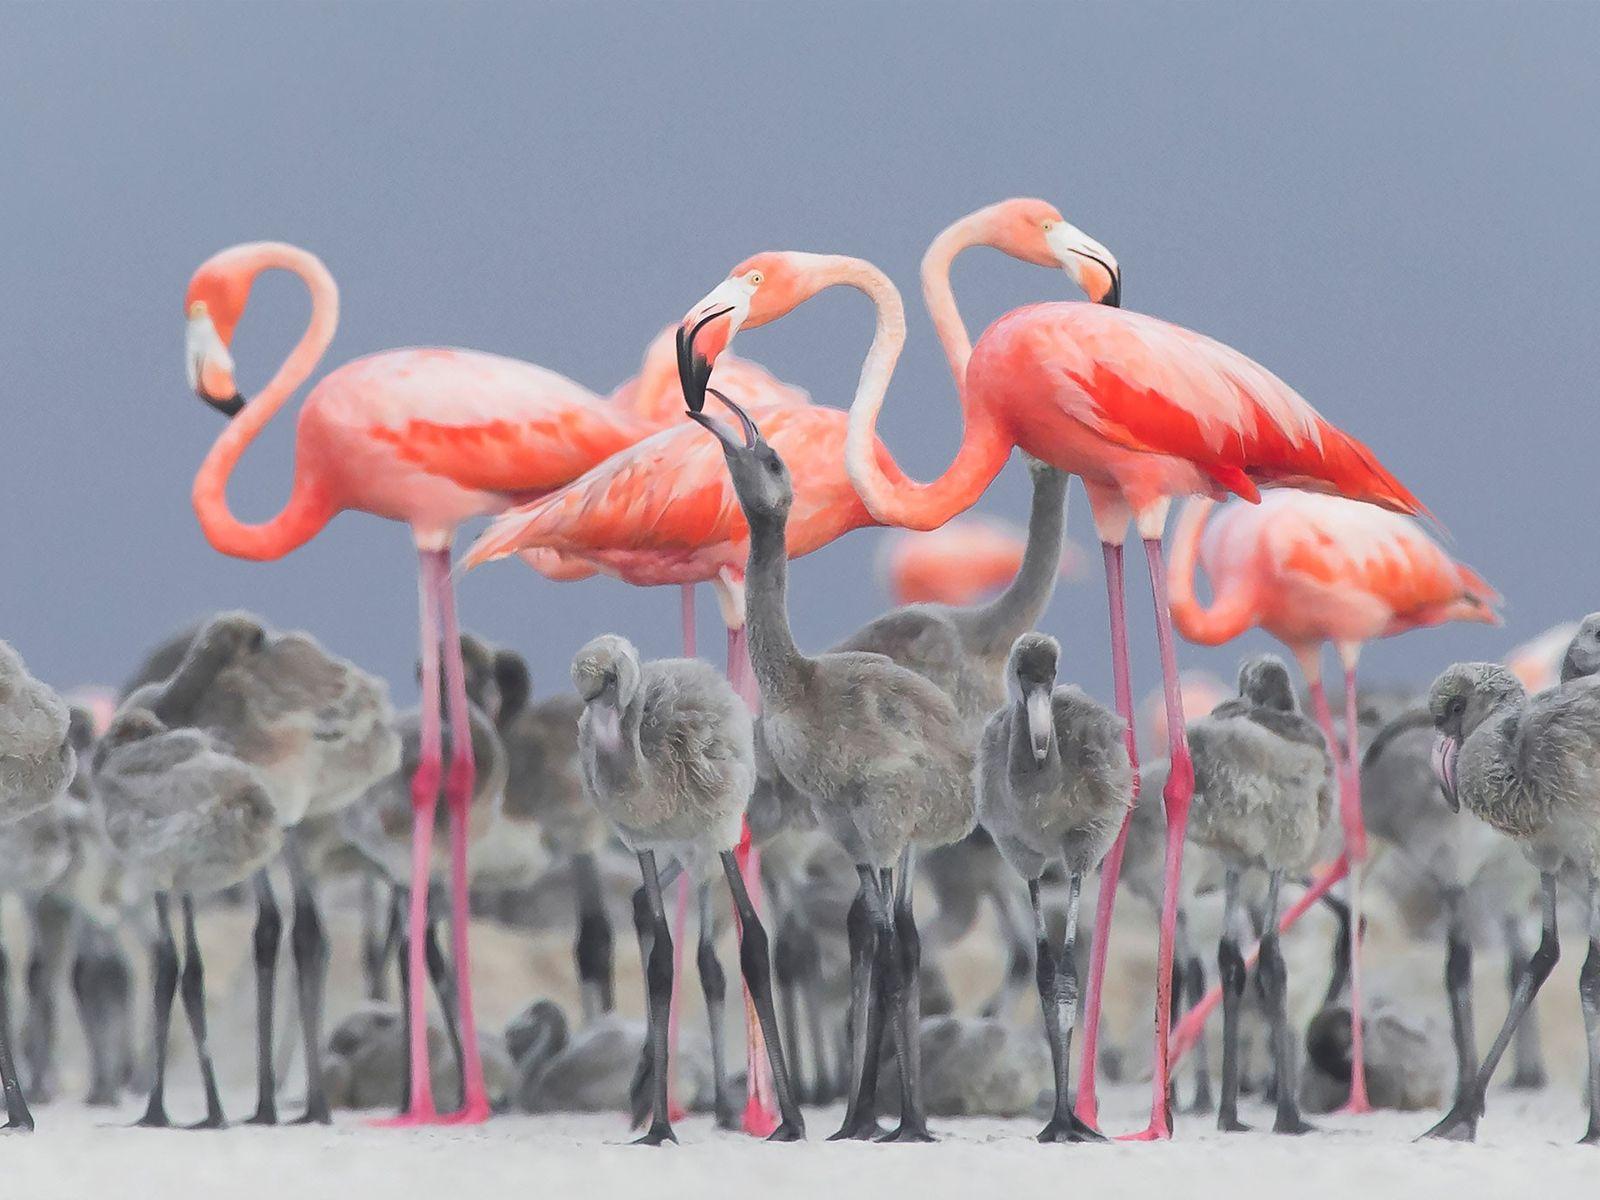 A vibrant image of pink flamingos feeding their young at a nesting area in Río Lagartos, ...